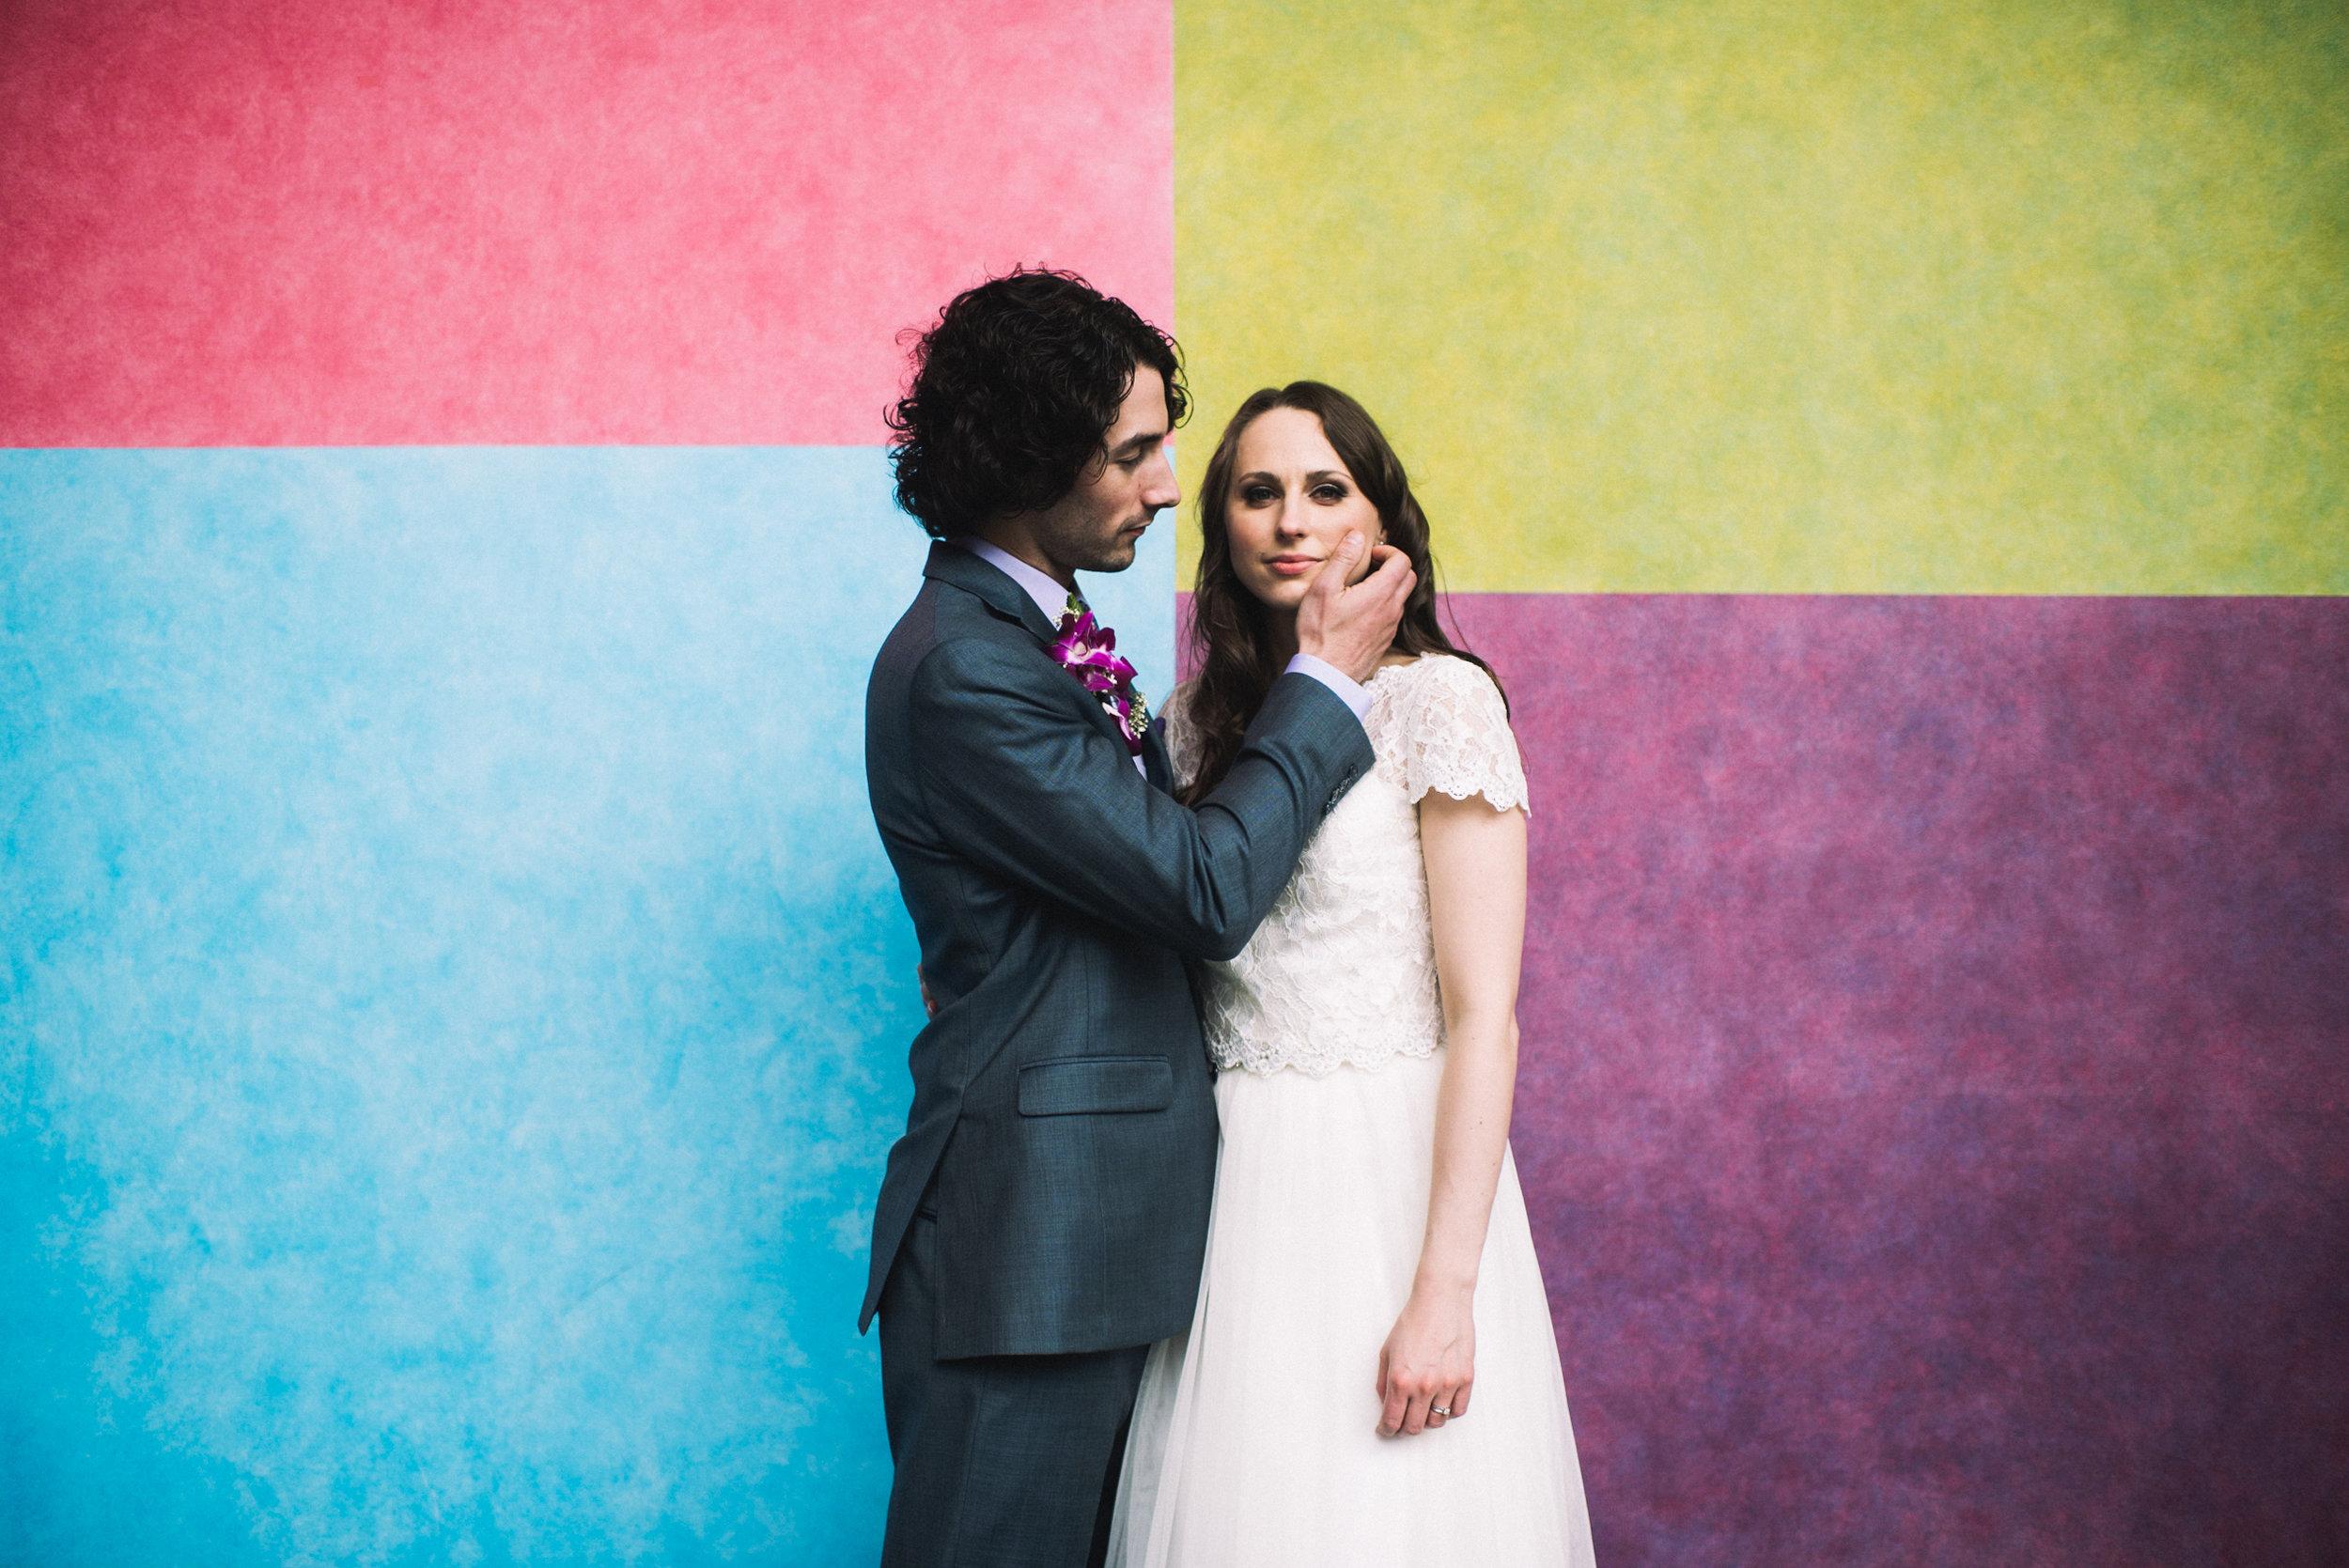 Pittsburgh Elopement Wedding Photographer - Carnegie Museum - Olya Tyler440.jpg